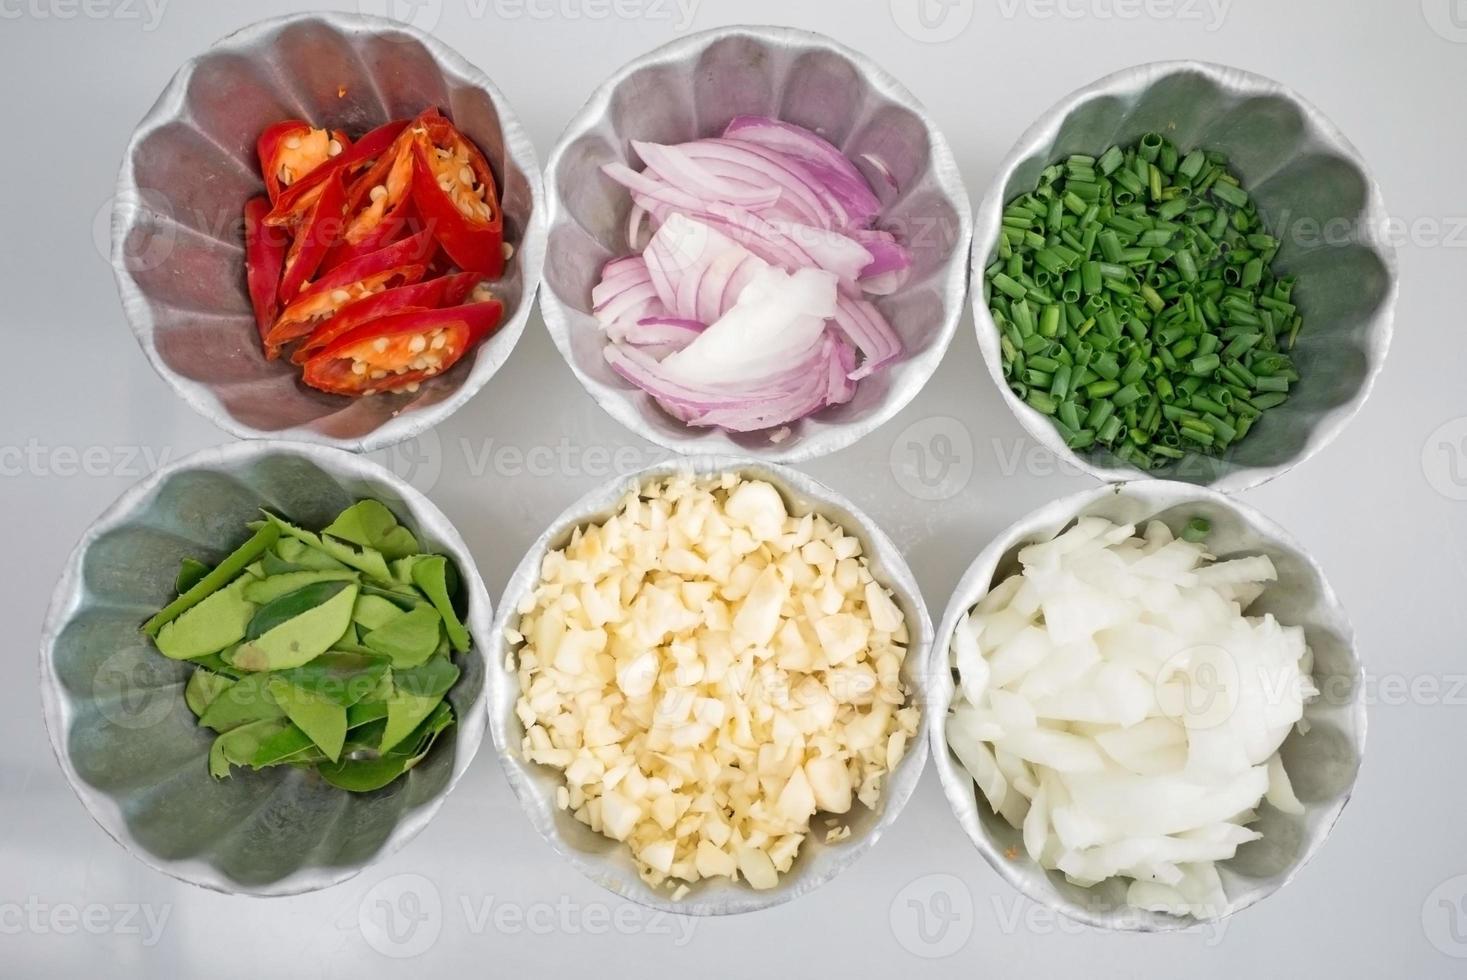 Thaise voedselingrediënten foto